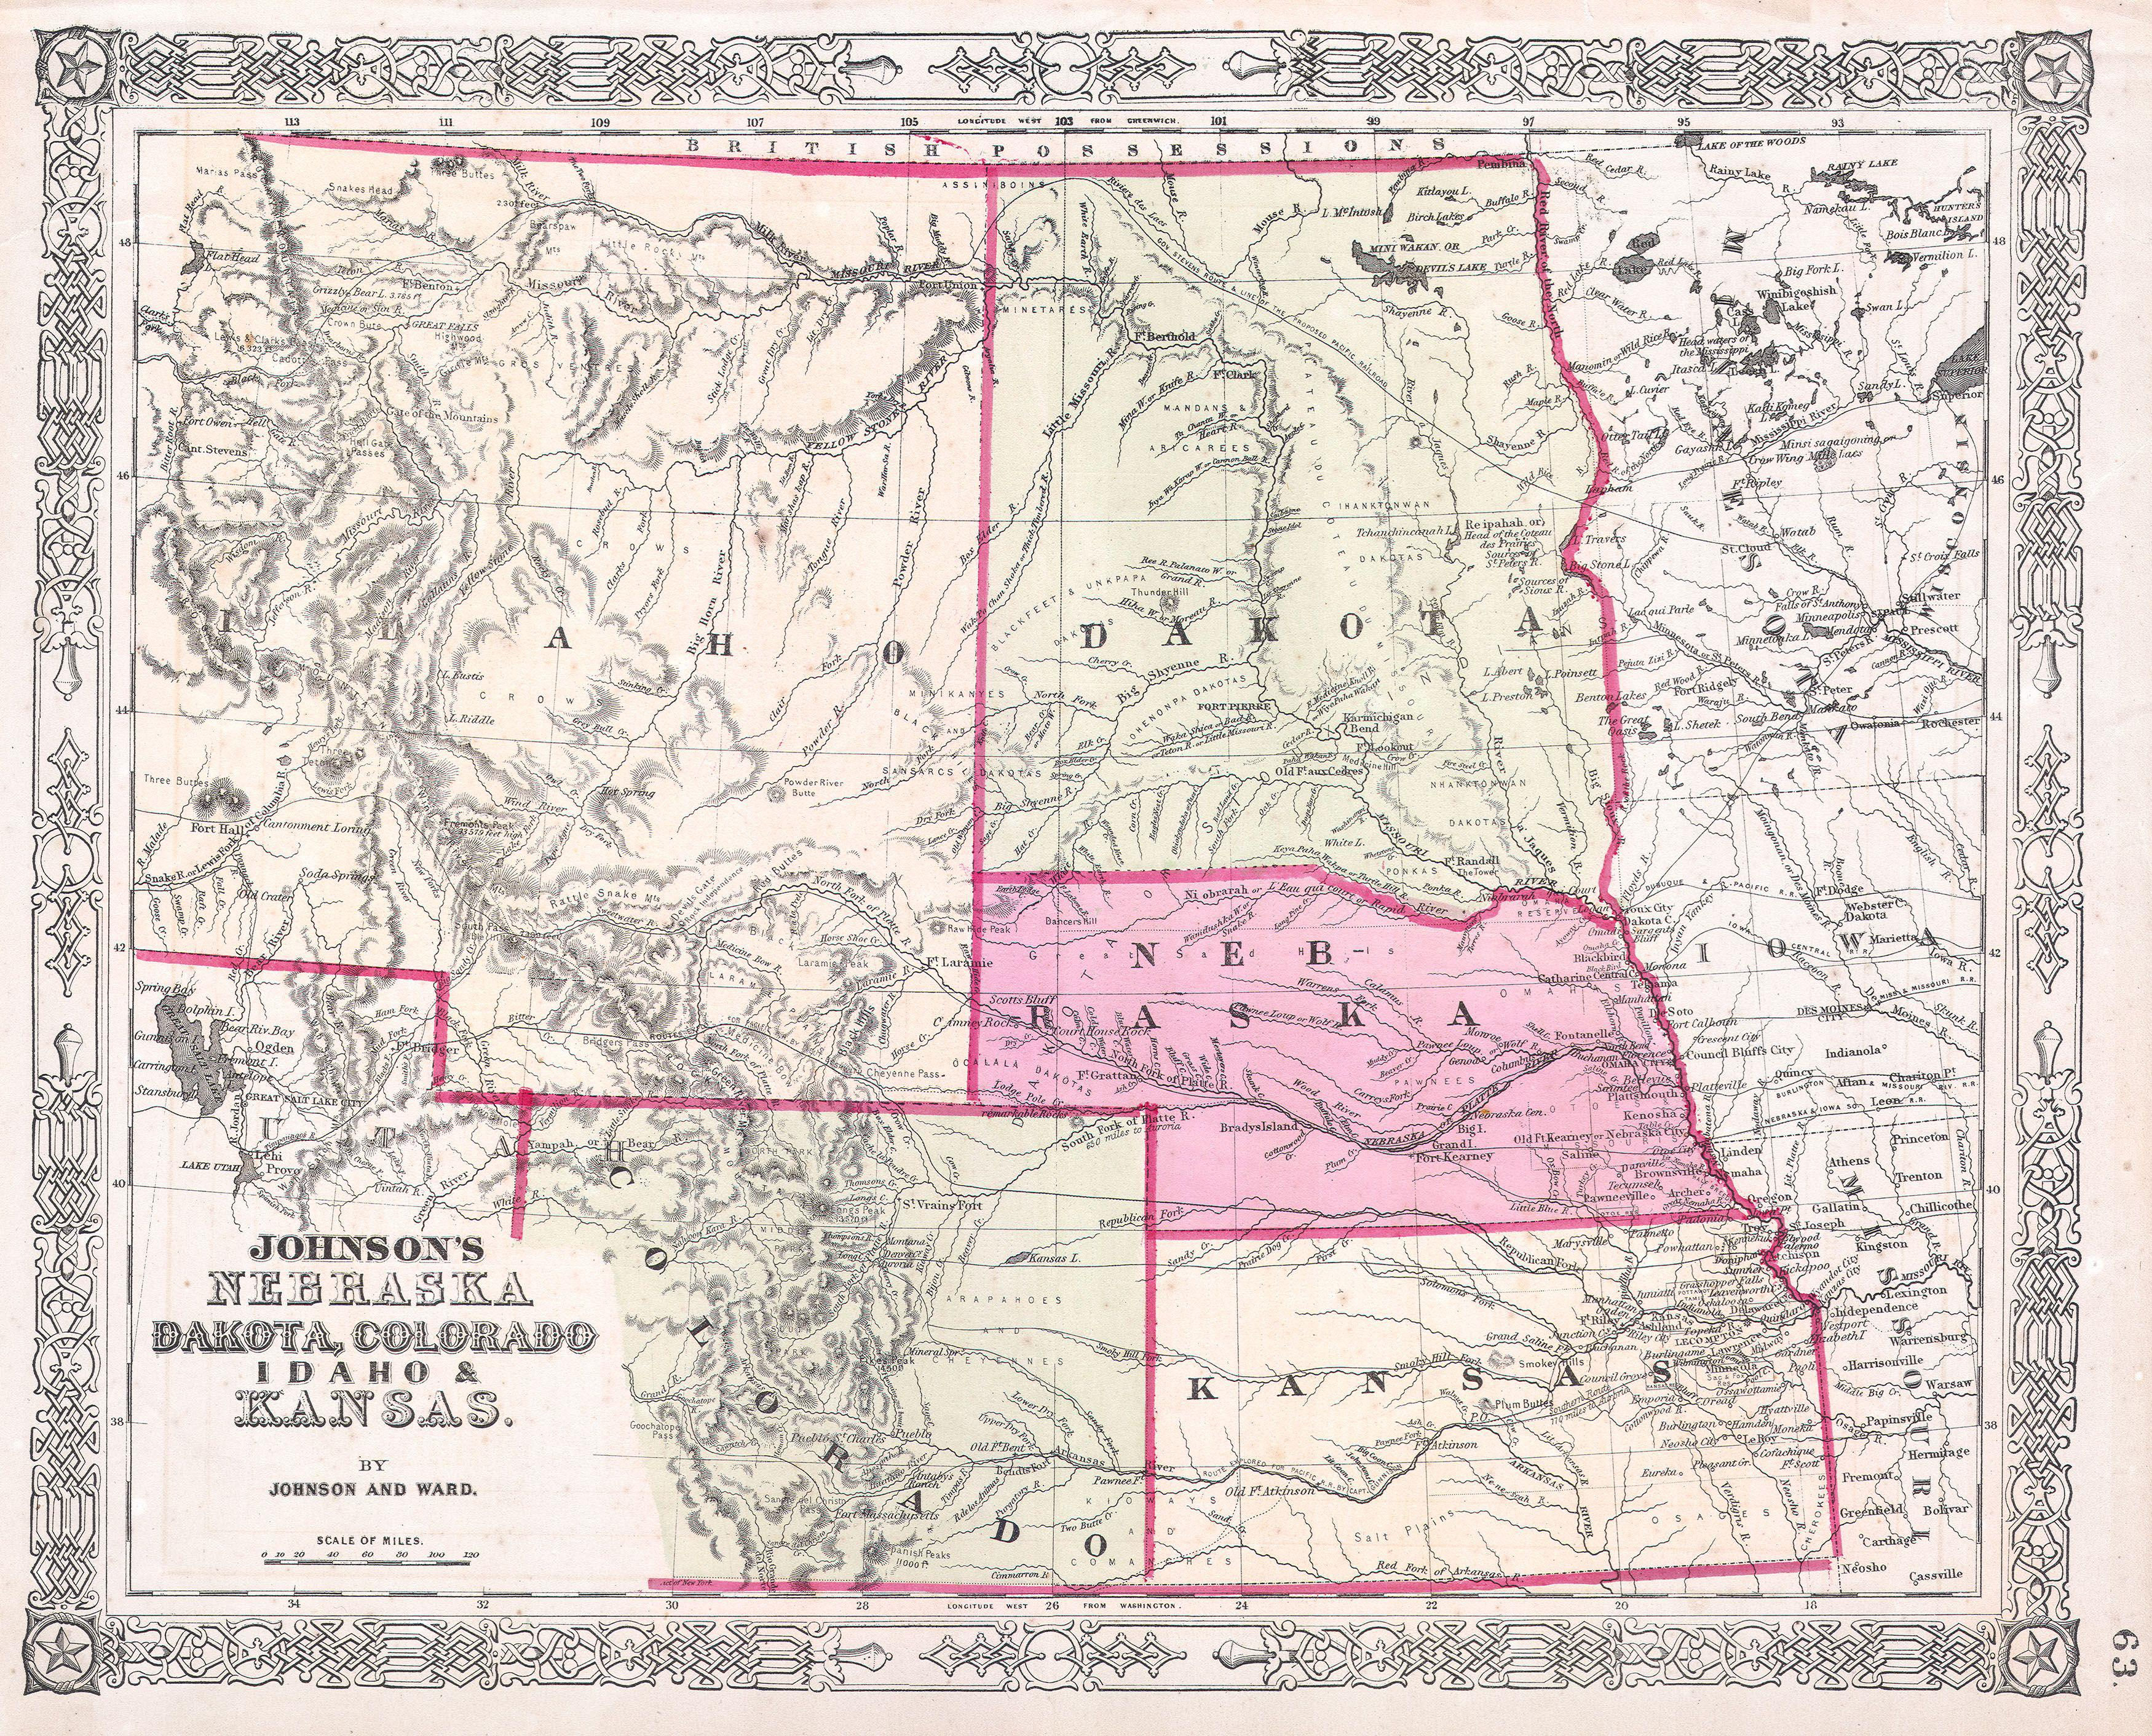 File:1863 Johnson's Map of Colorado, Dakota, Idaho, Nebraska